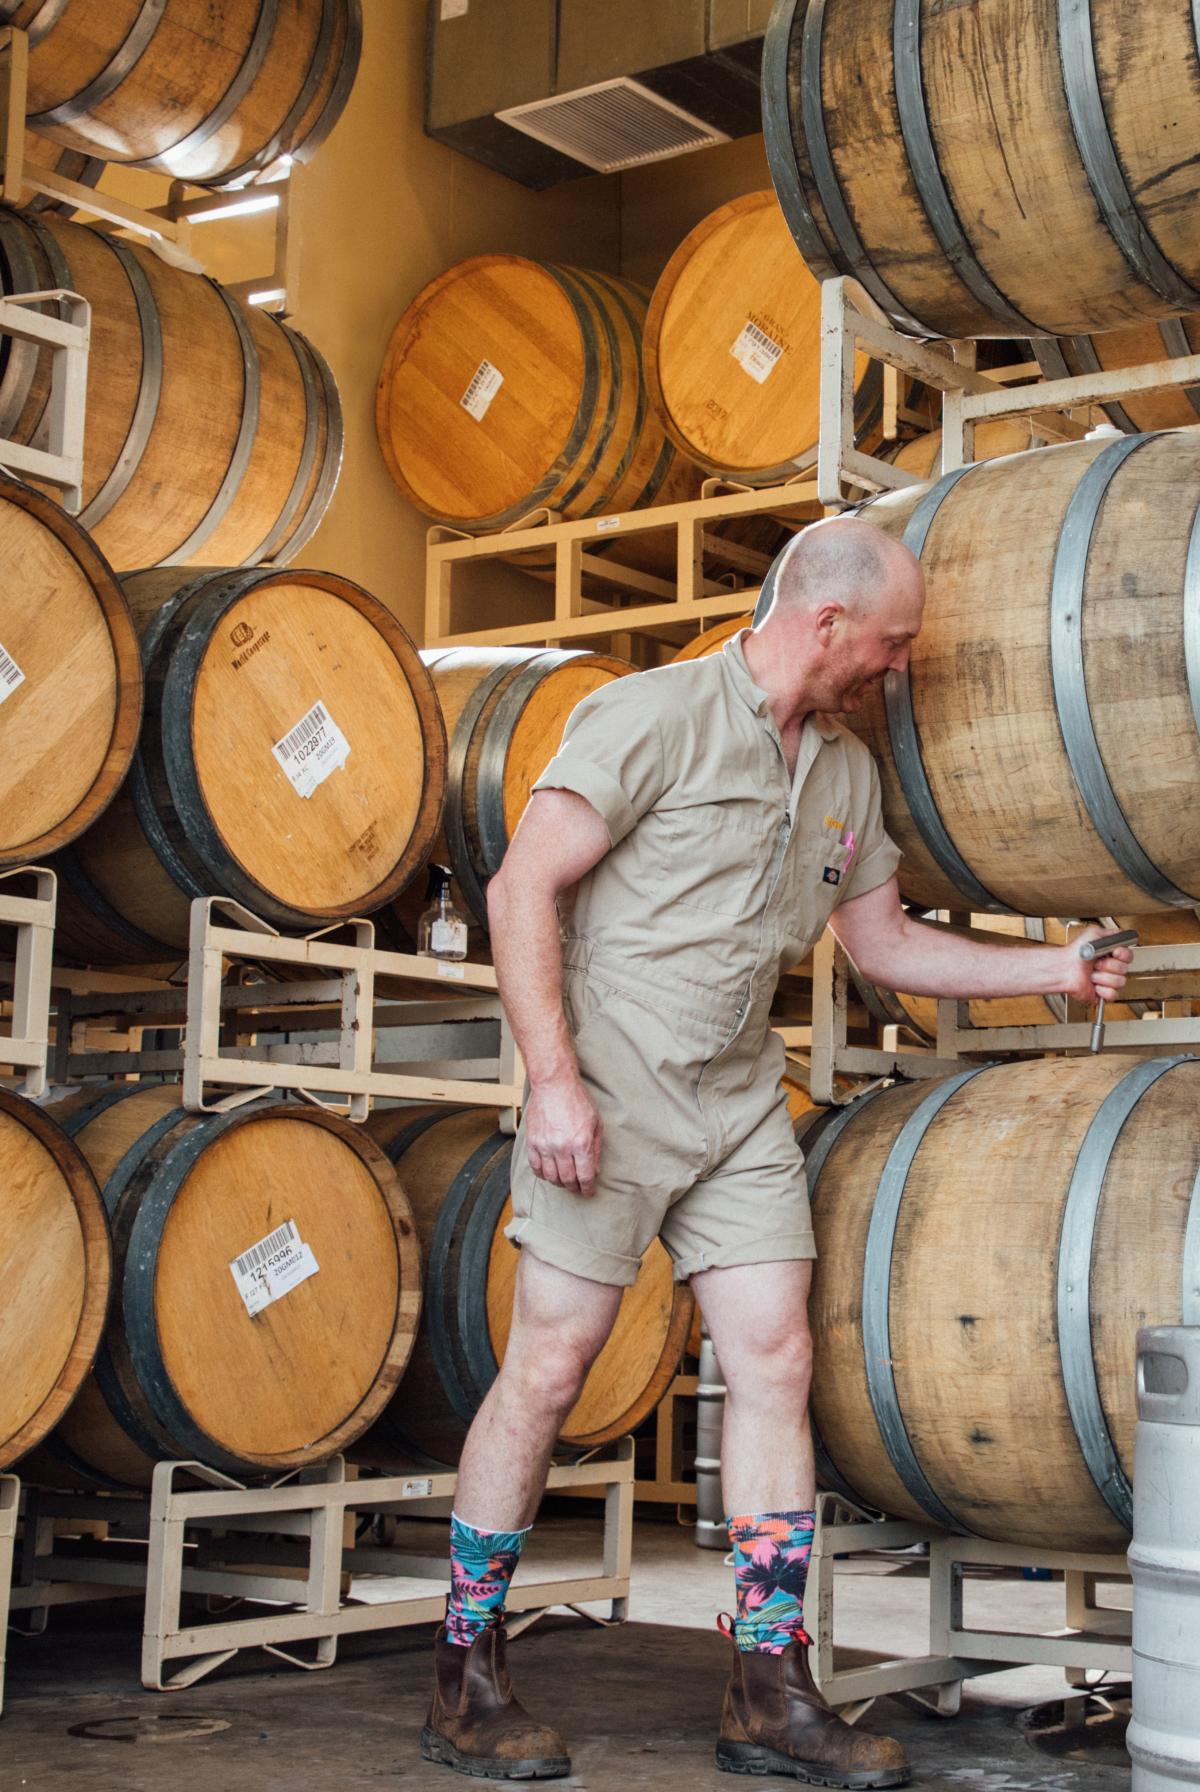 Taking a barrel sample